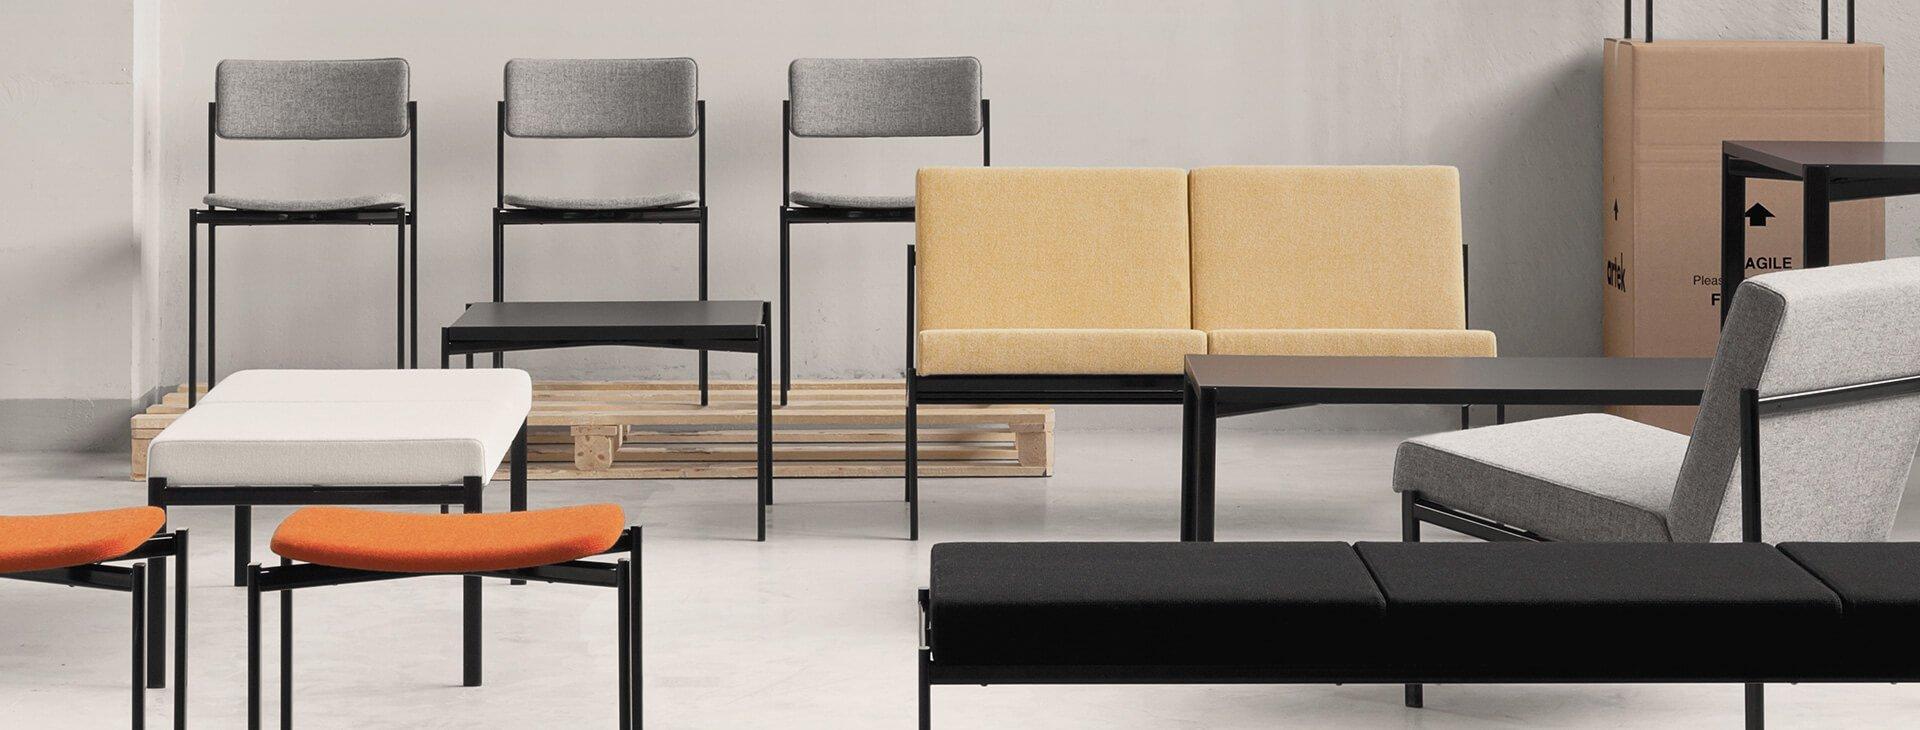 artek ihre brands im stilwerk berlin. Black Bedroom Furniture Sets. Home Design Ideas